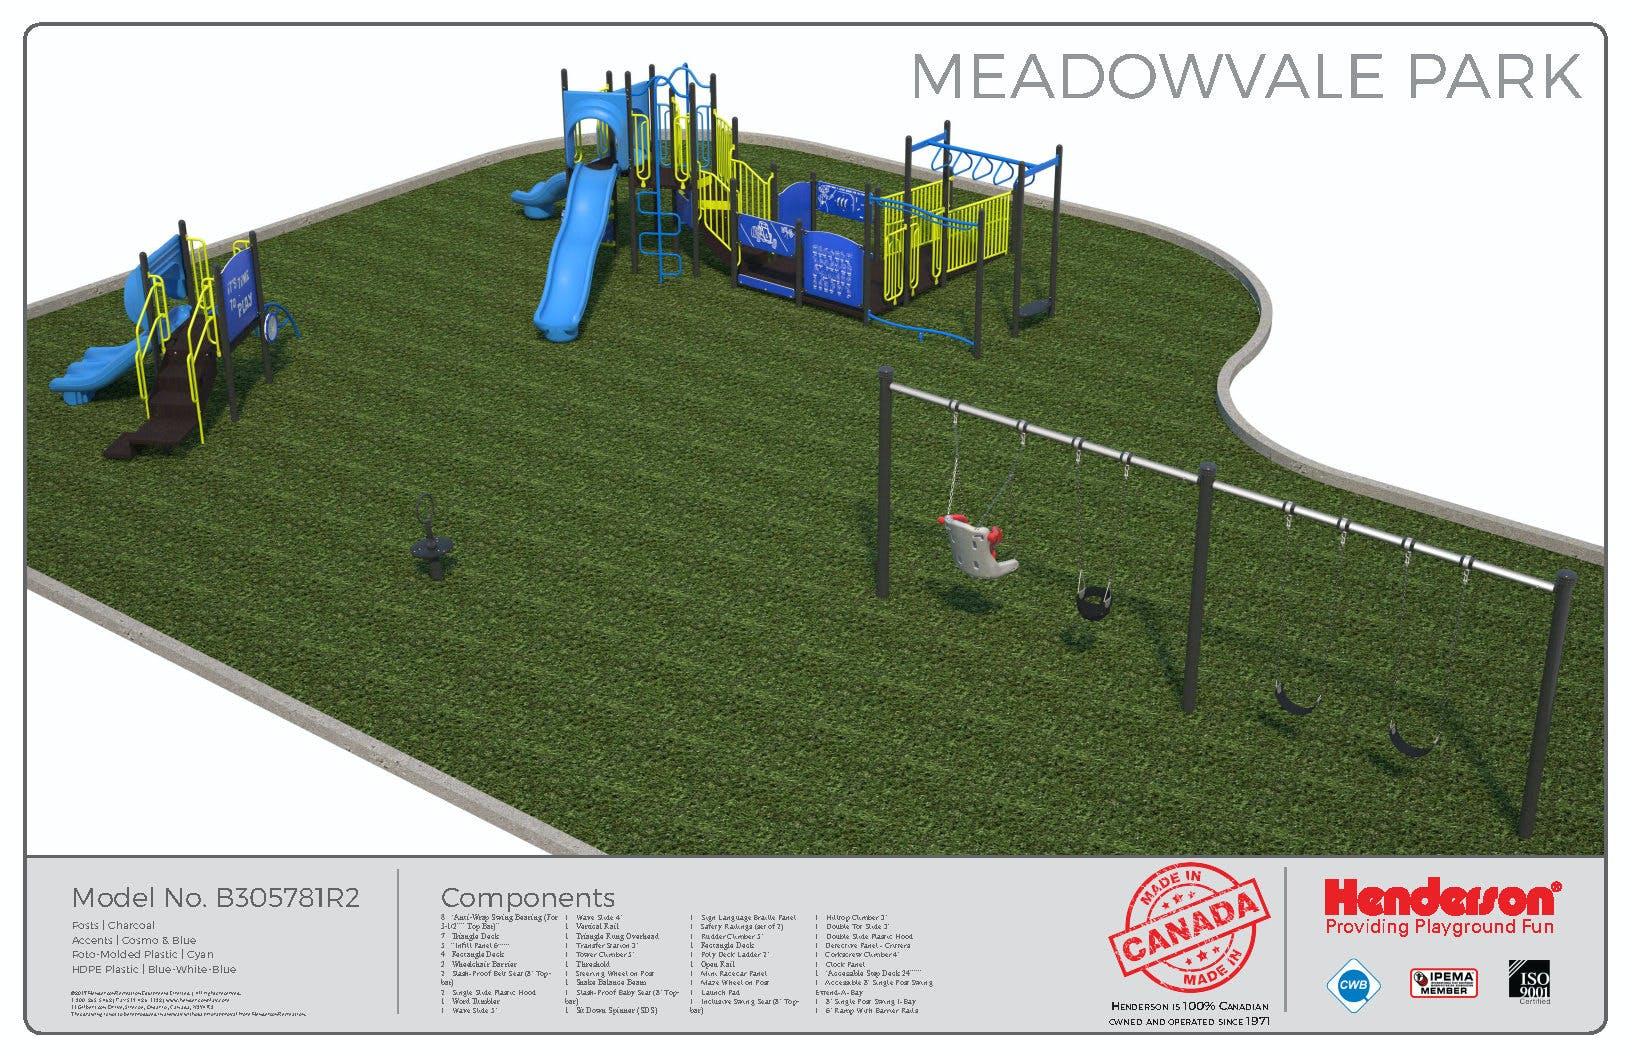 Meadowvale Park Playground